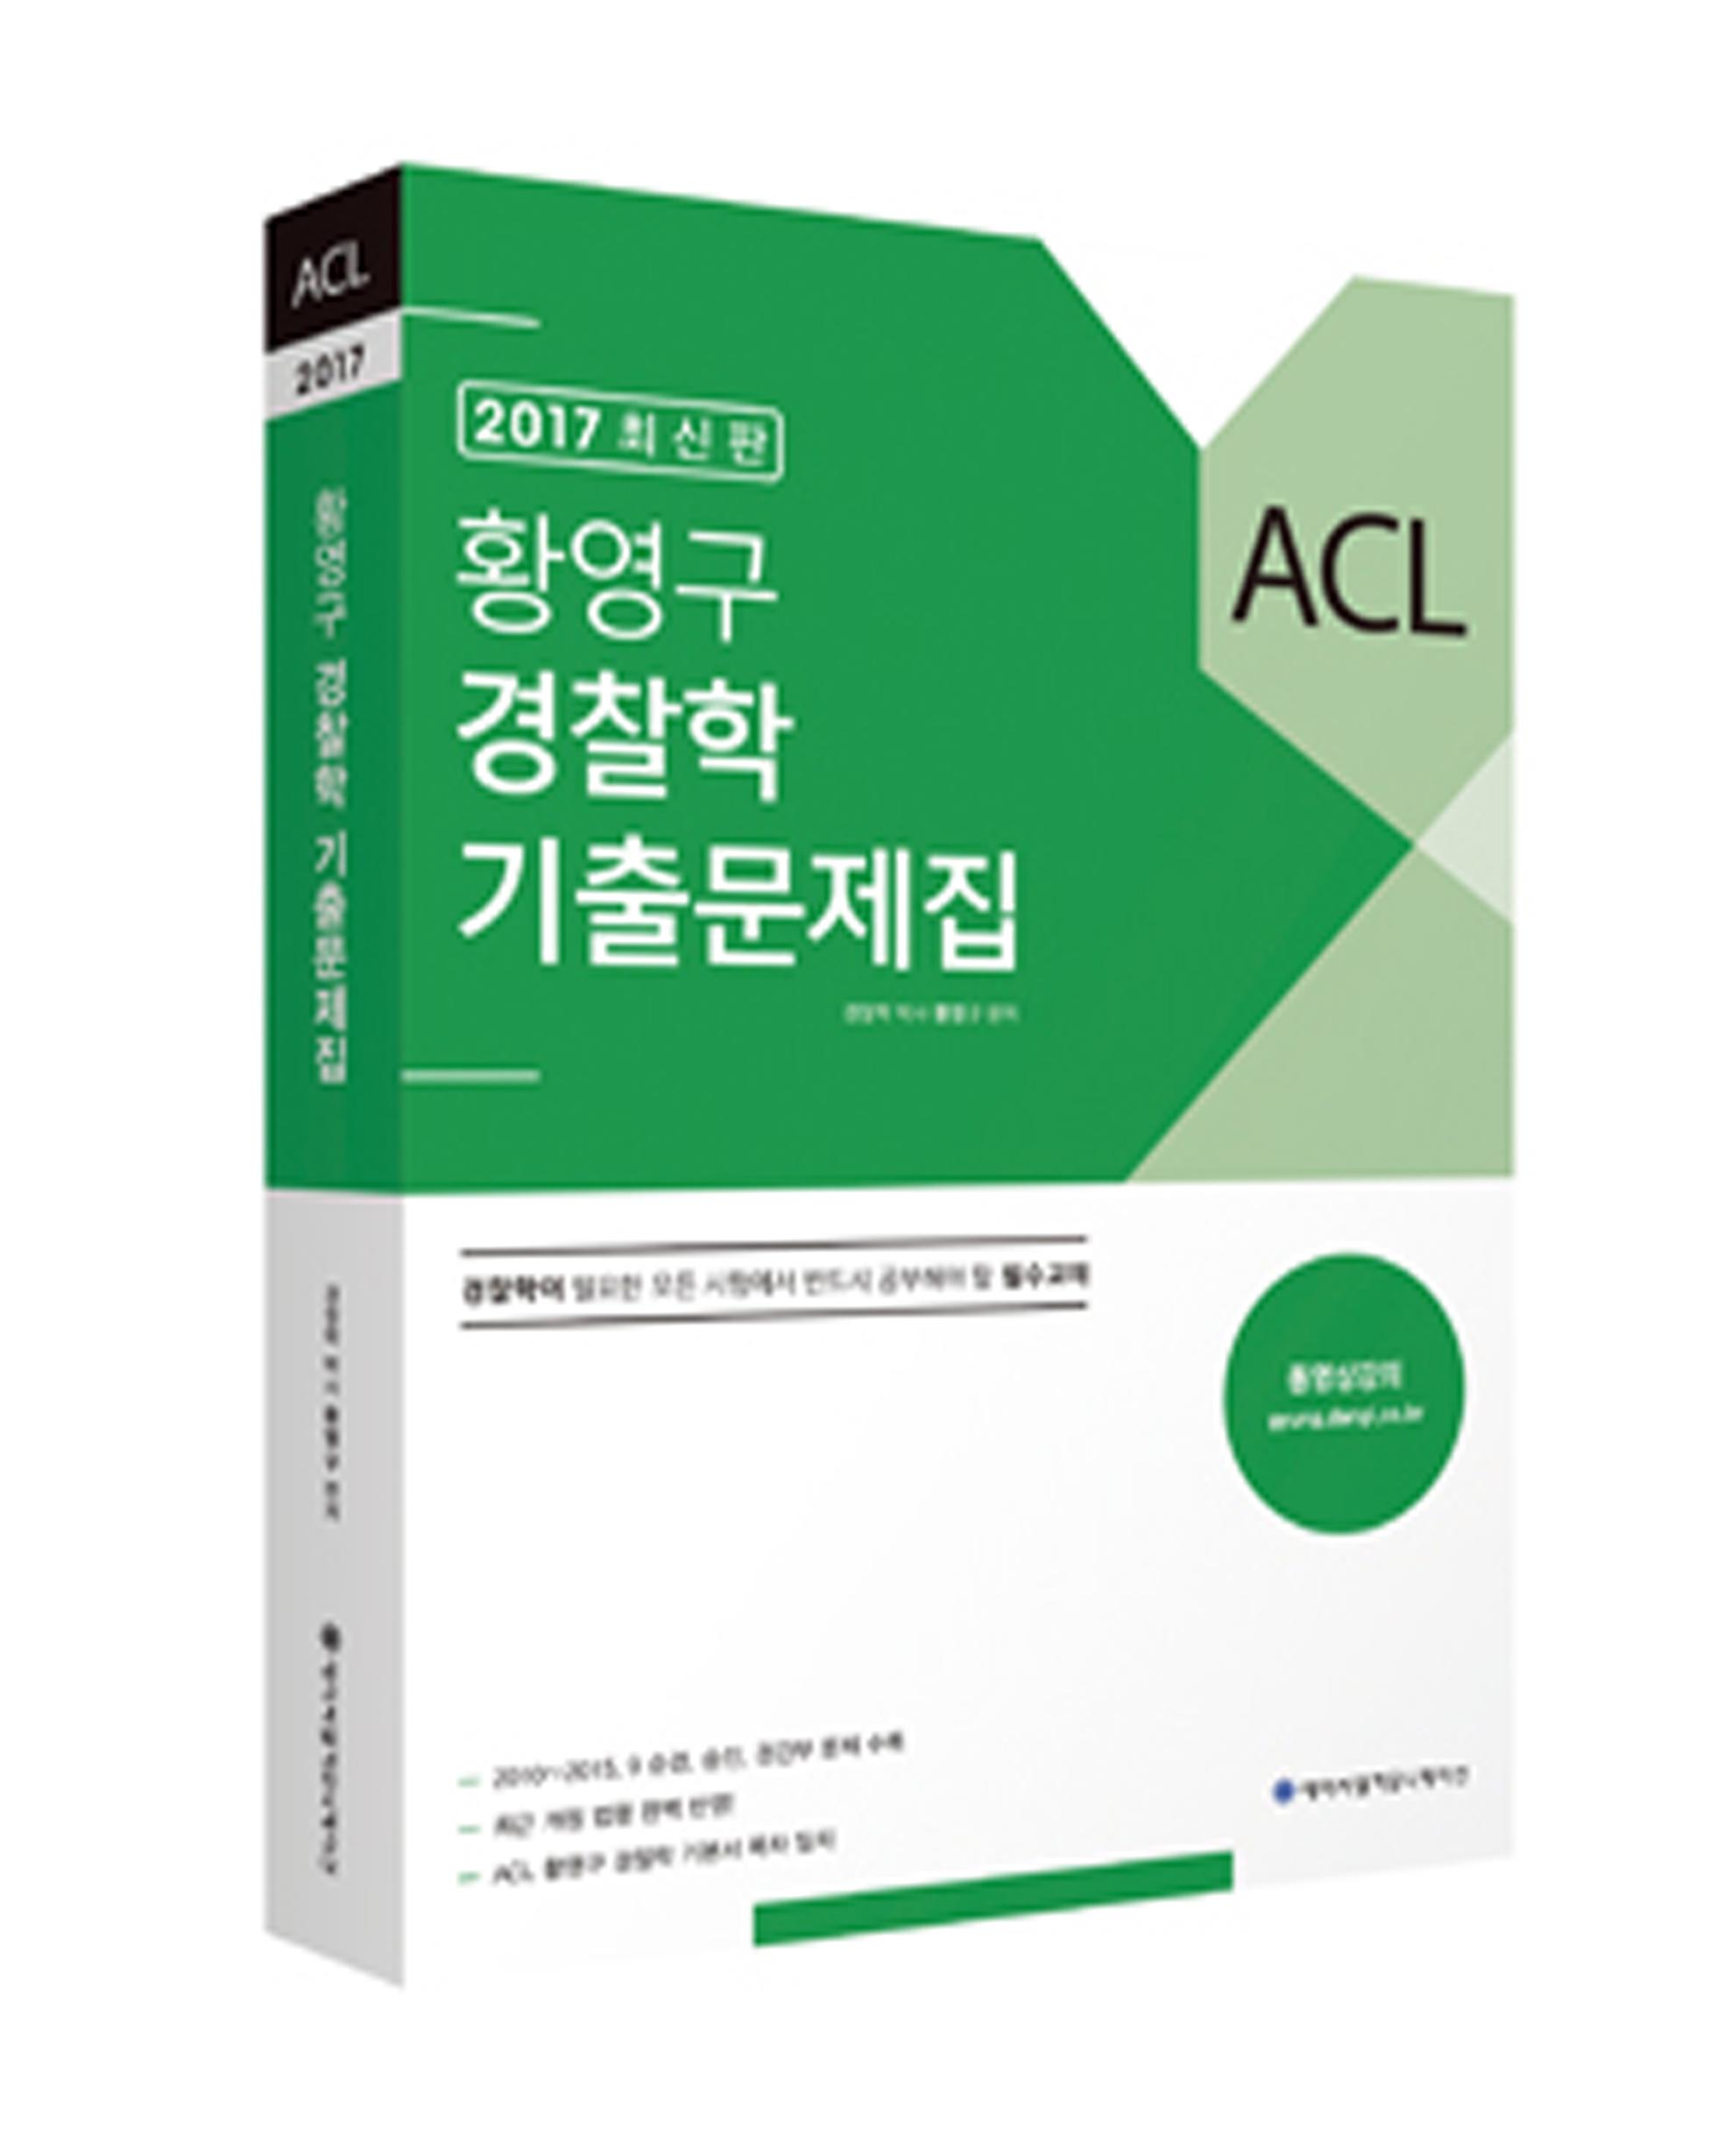 2017 ACL 황영구 경찰학 기출문제집